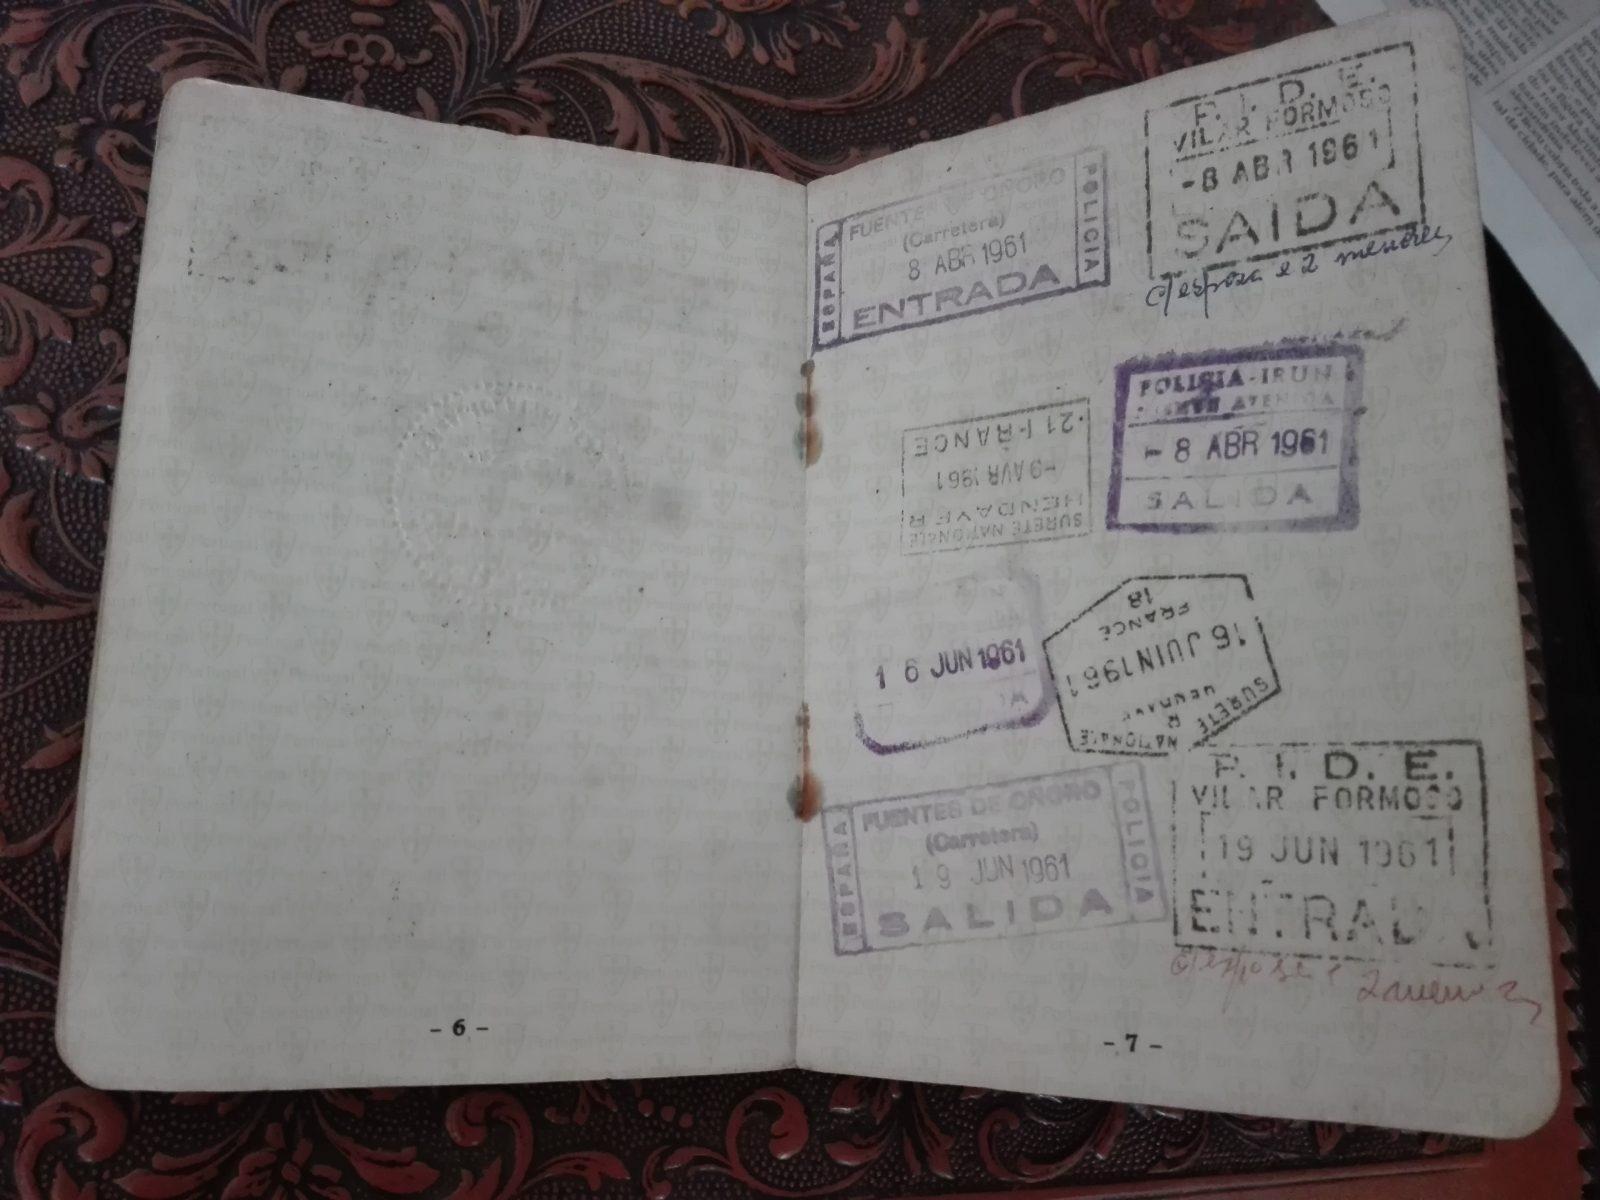 Passaporte - carimbos